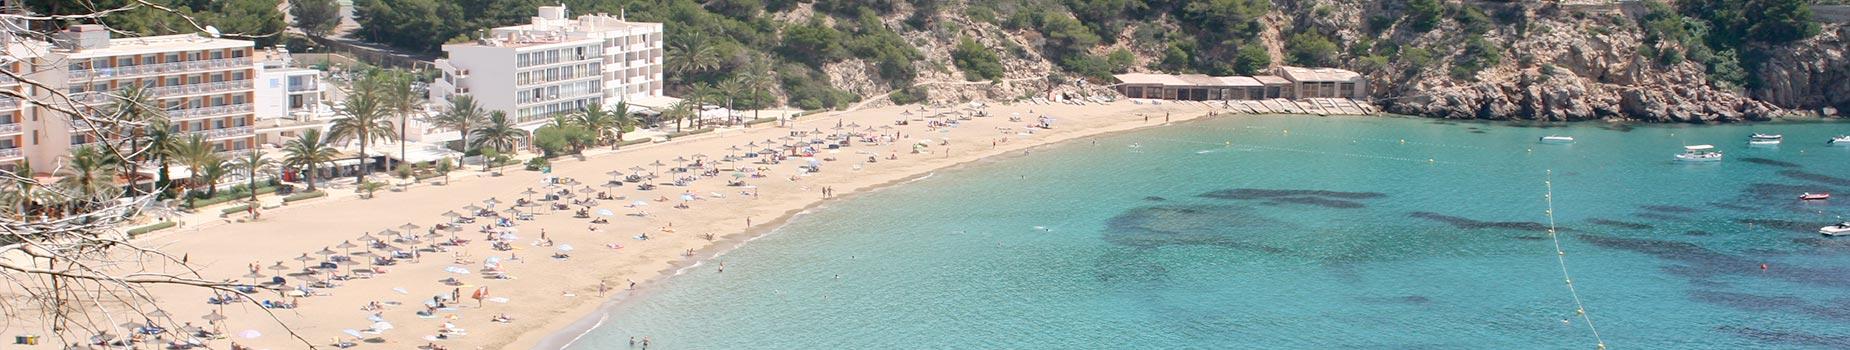 Vliegvakantie Ibiza